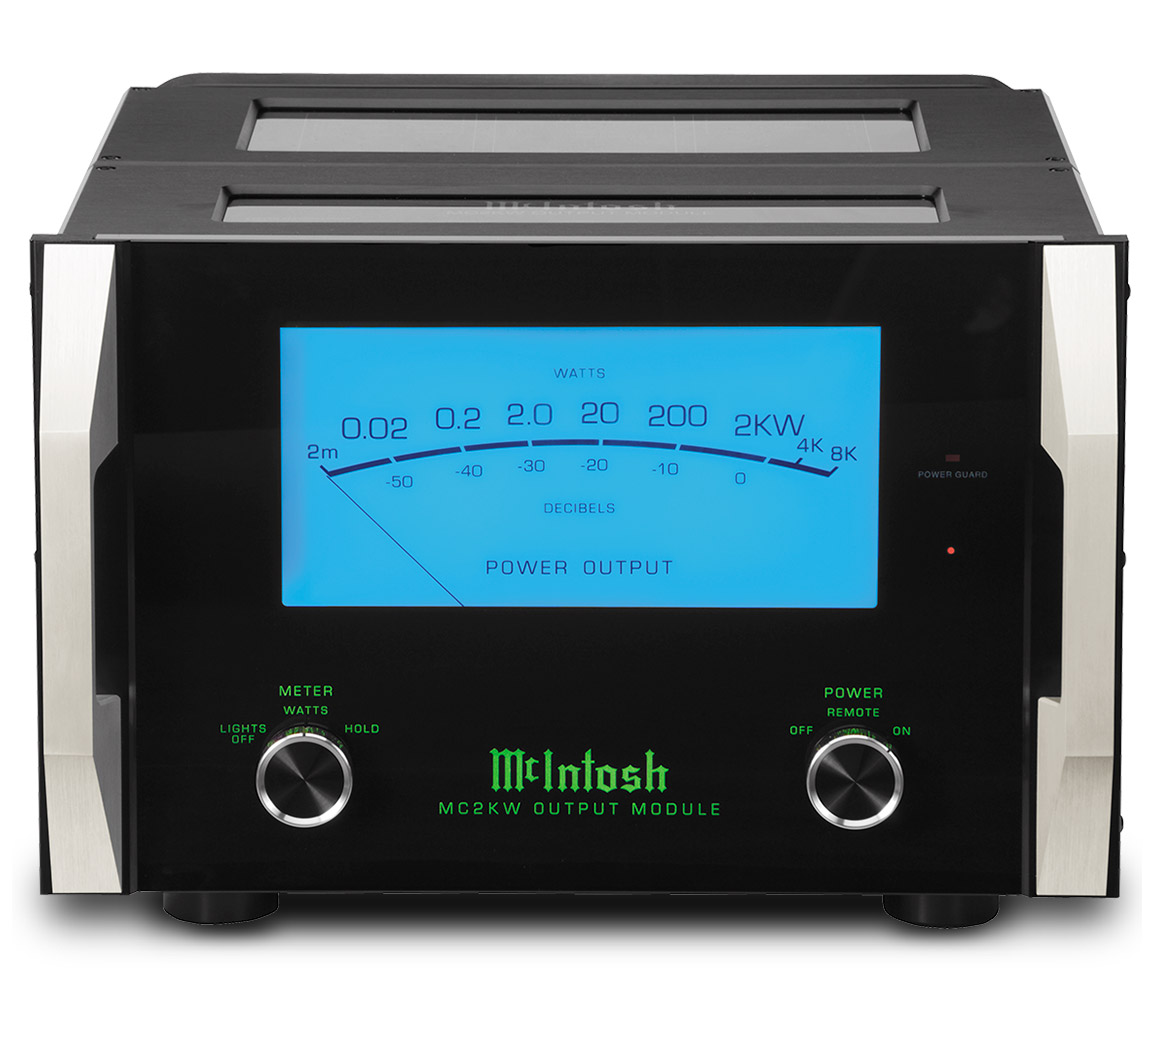 Mcintosh Mc2kw Amplifier Modular Audio Preamplifier